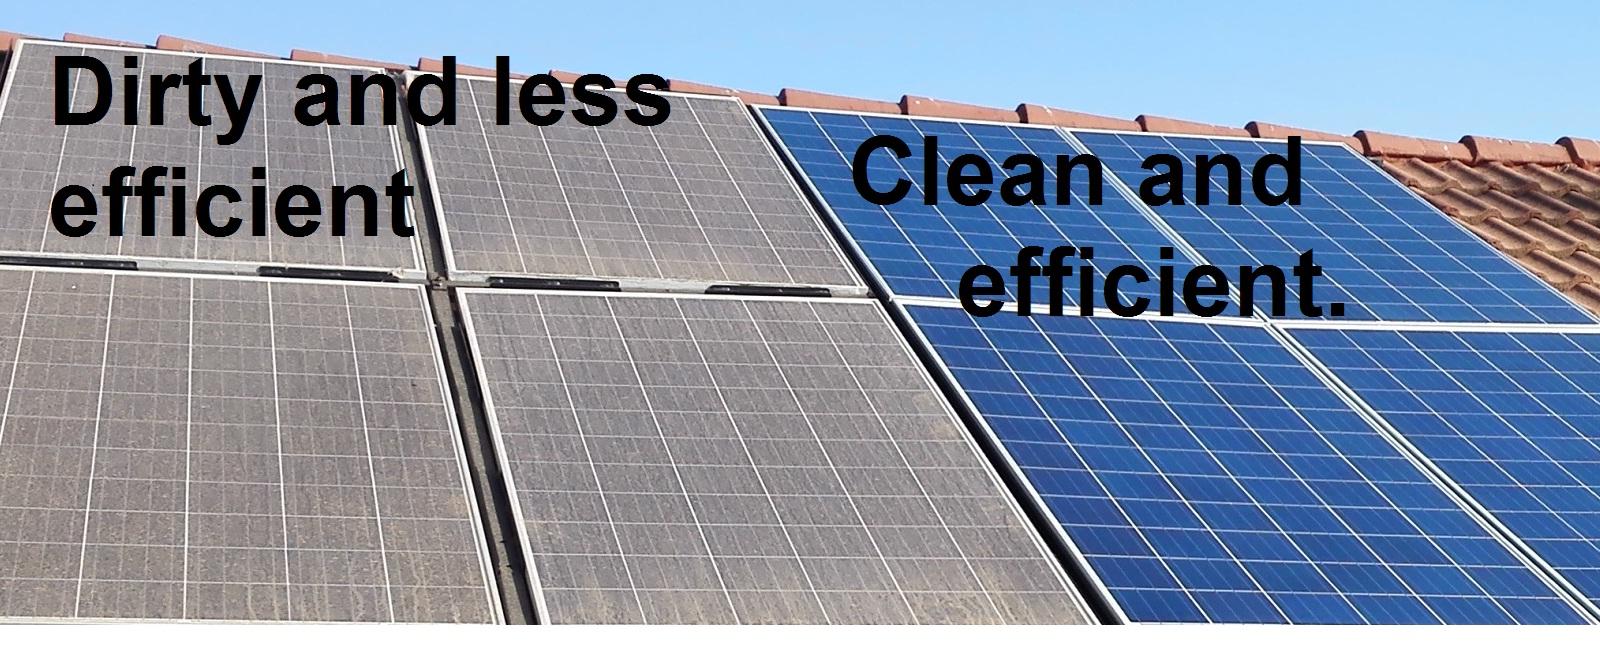 Dirty vs clean solar panels